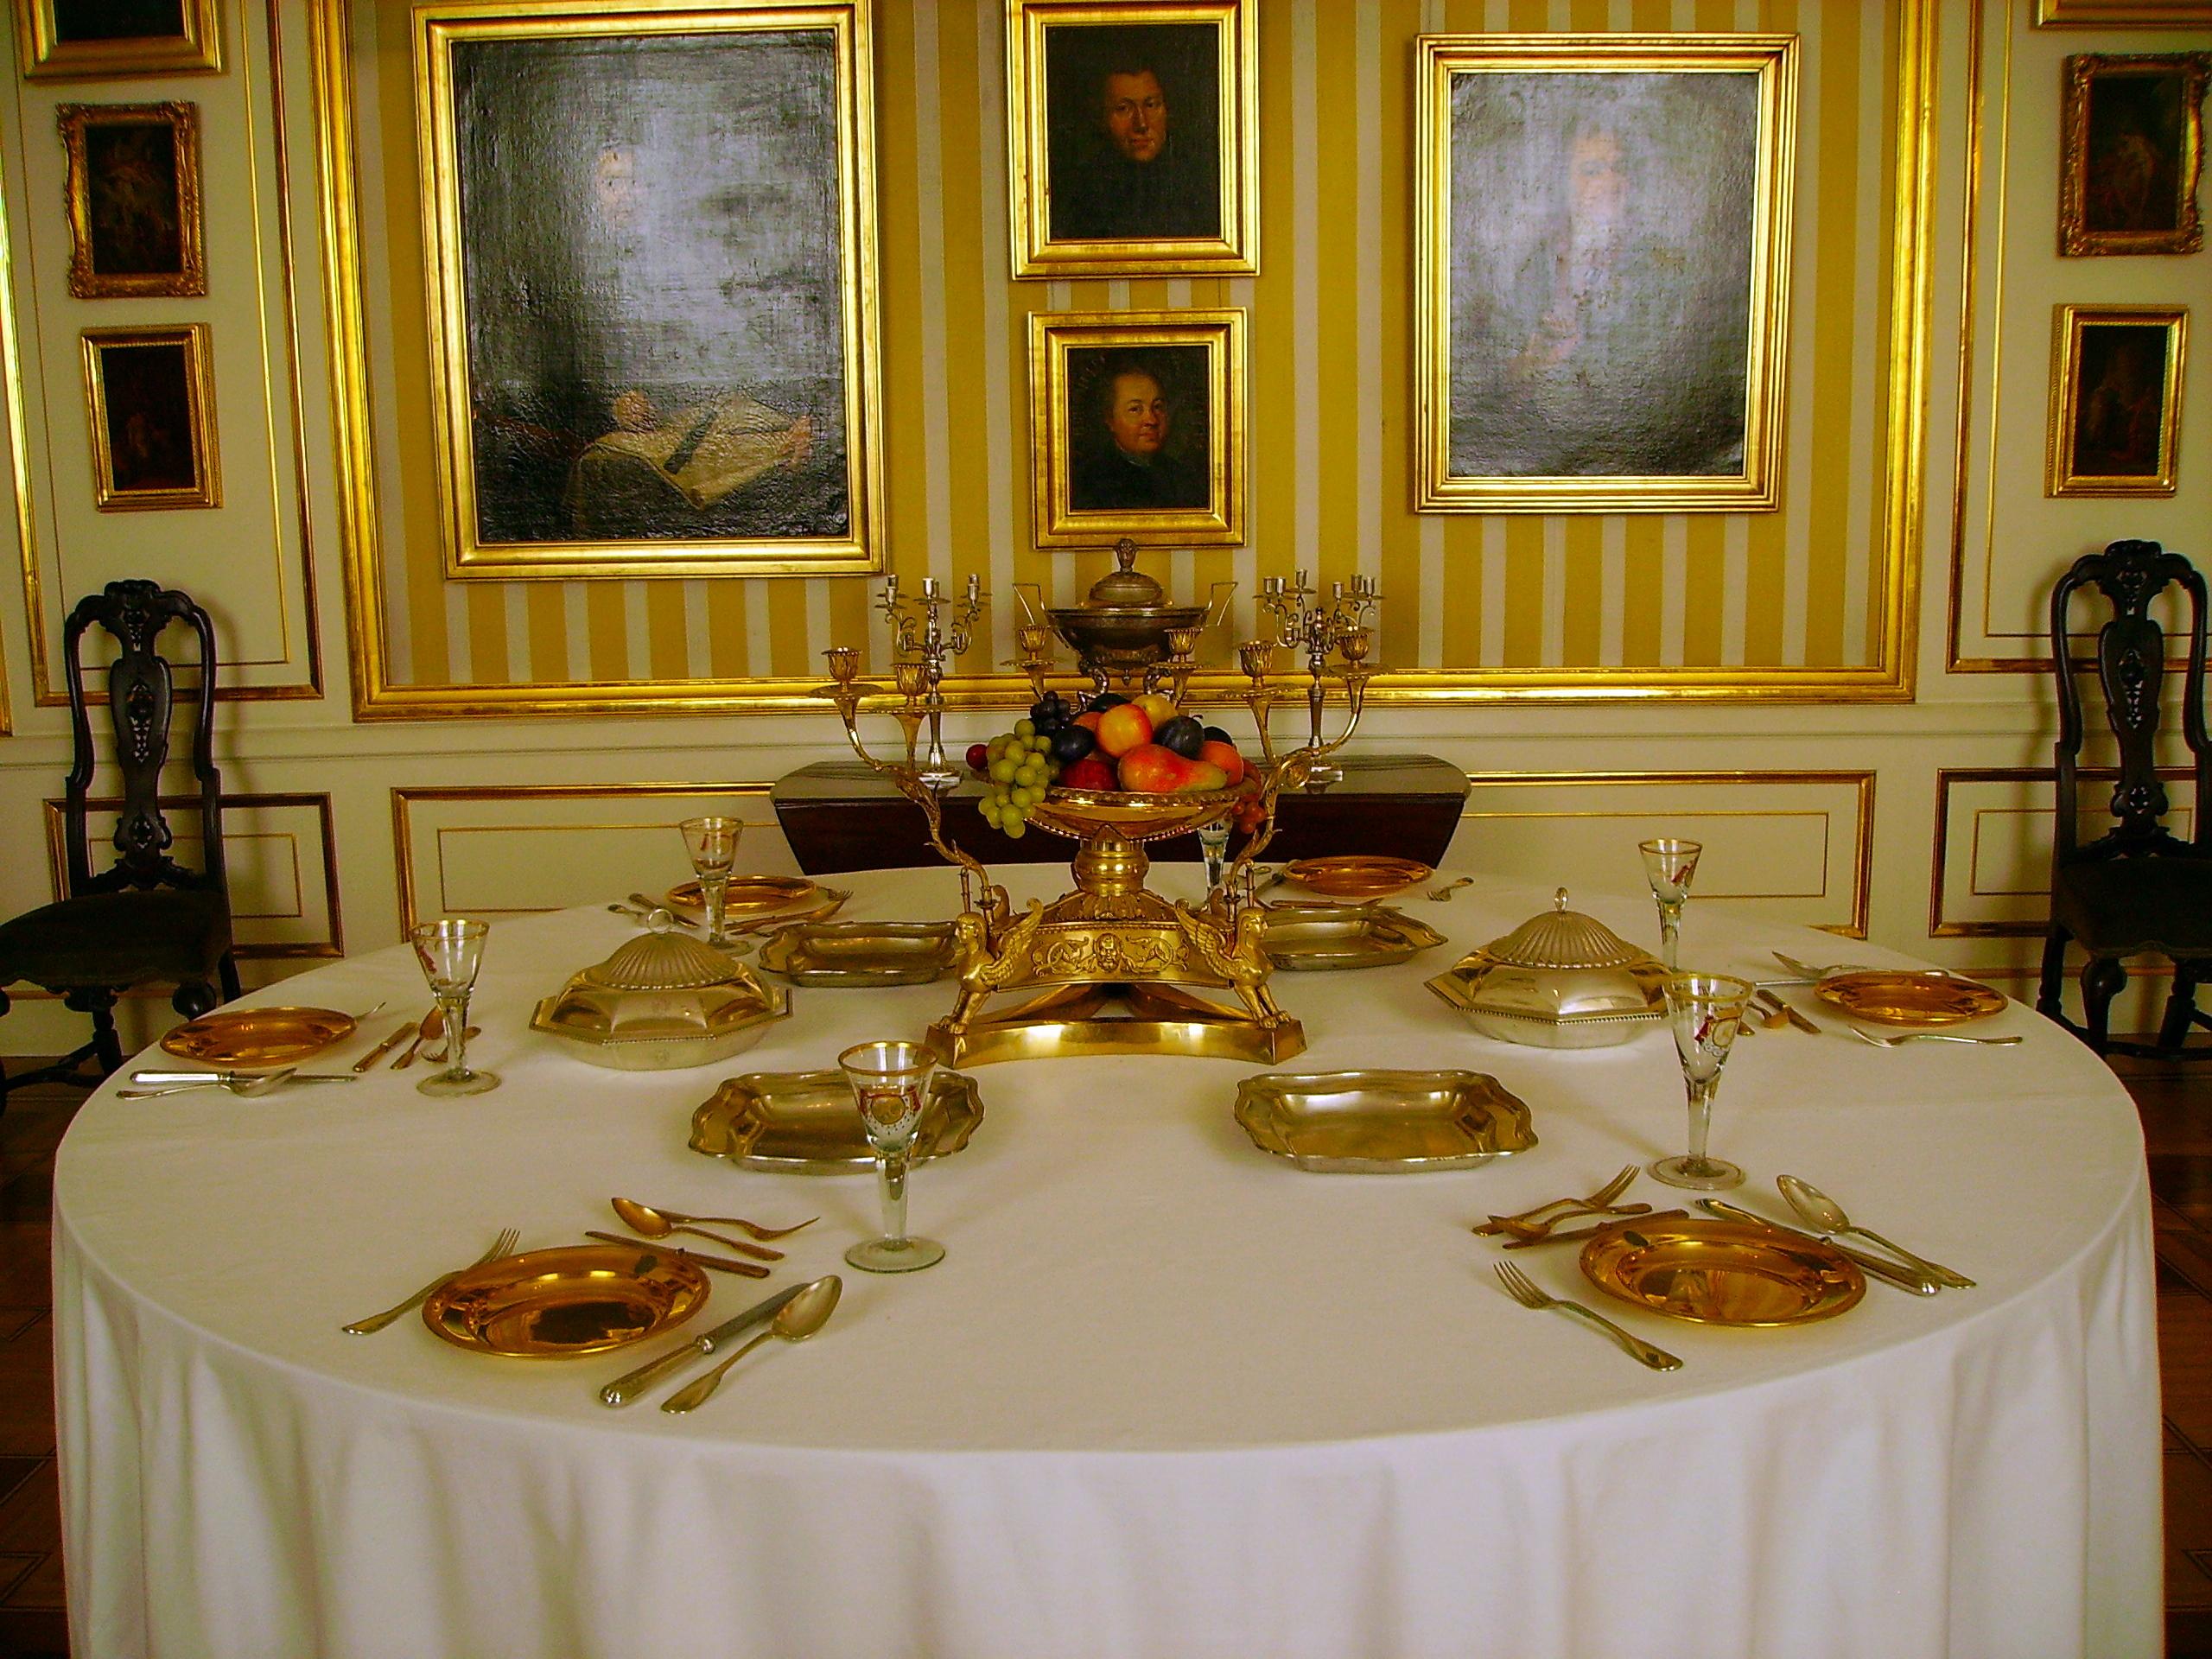 File:Warsaw Royal Castle GM (21).JPG - Wikimedia Commons